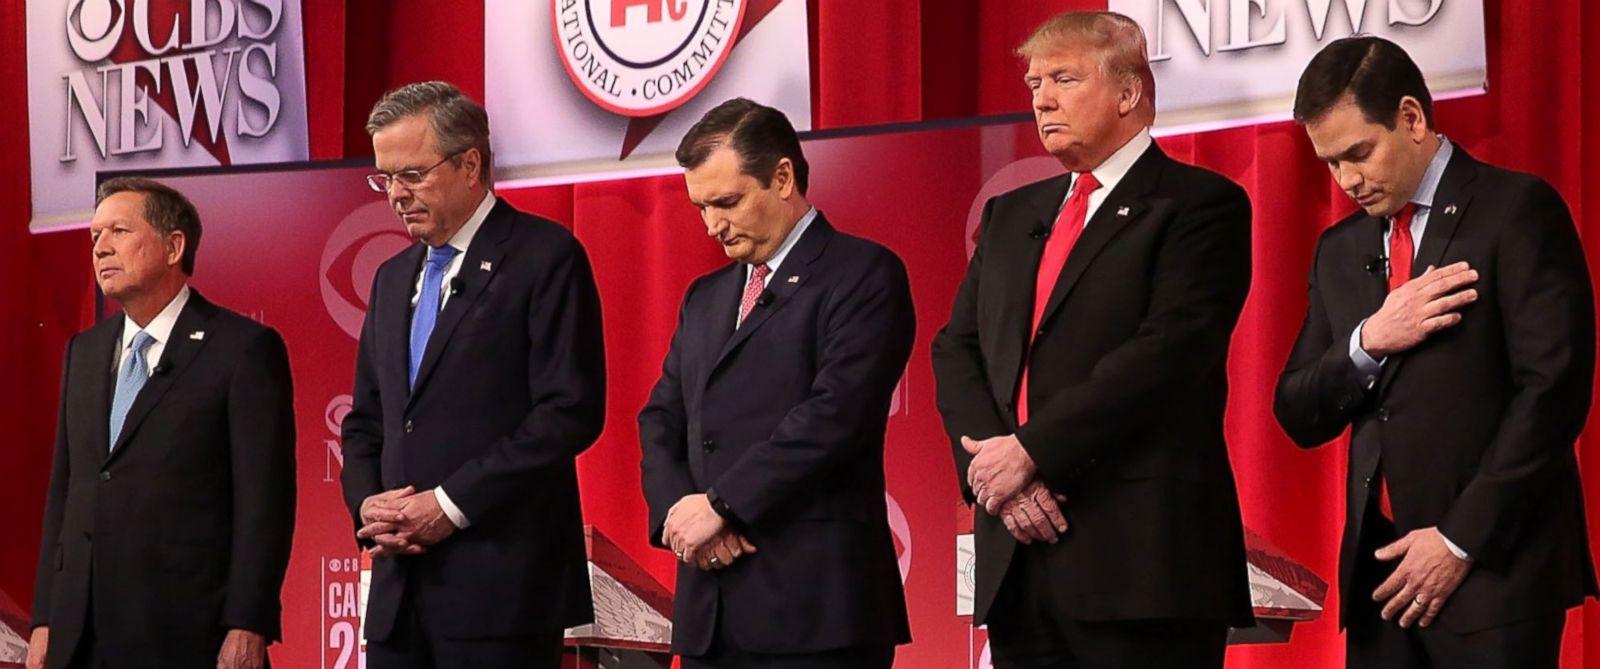 PHOTO: From left, Republican presidential candidates Ohio Gov. John Kasich, Jeb Bush, Sen. Ted Cruz, Donald Trump and Sen. Marco Rubio participated in a moment of silence for U.S. Supreme Court Justice Antonin Scalia, Feb.13, 2016, in Greenville, S.C.